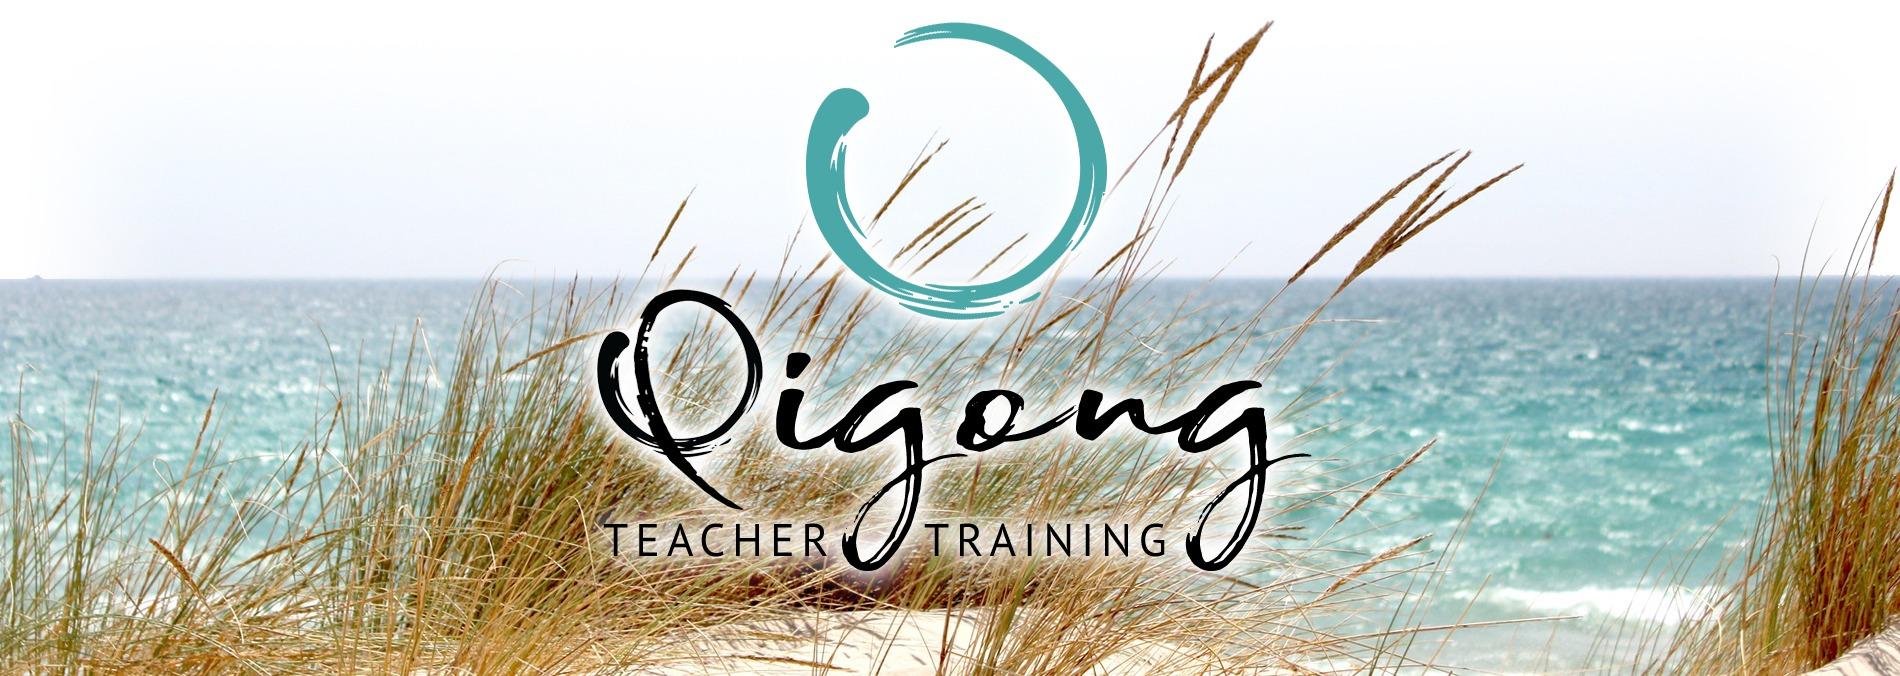 Qigong Teacher Training